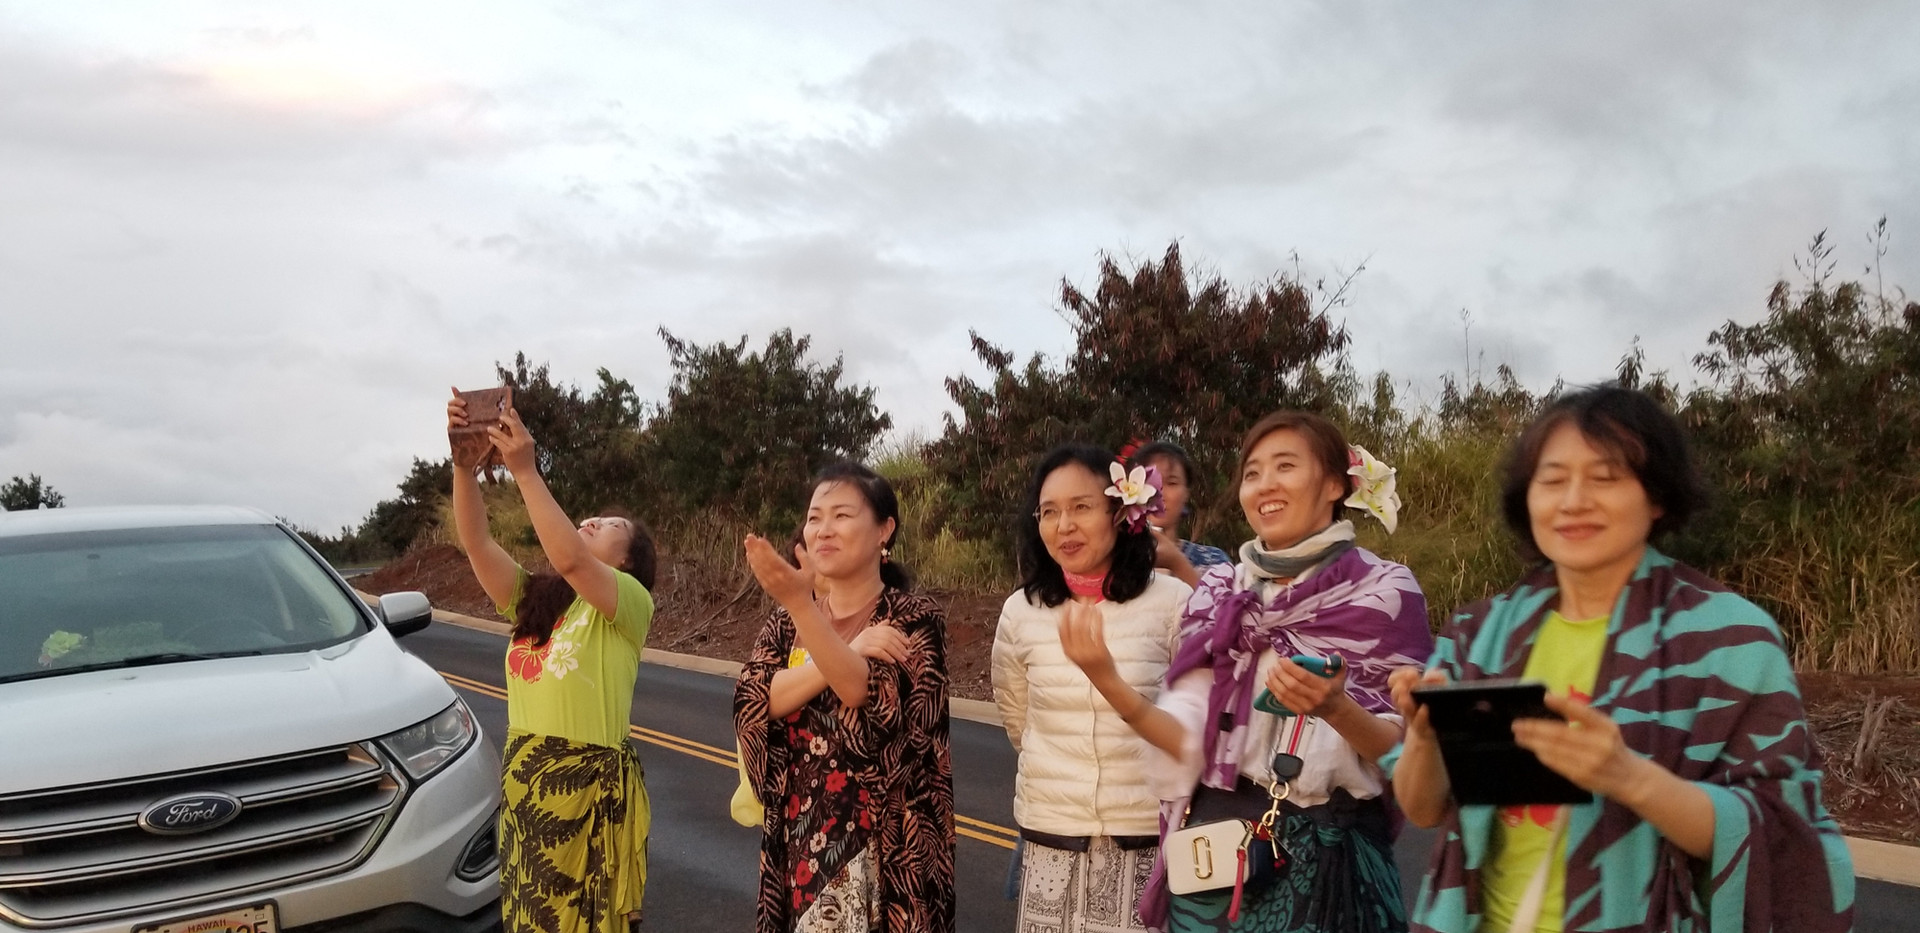 Korean Halau Group Visiting Kaua'i